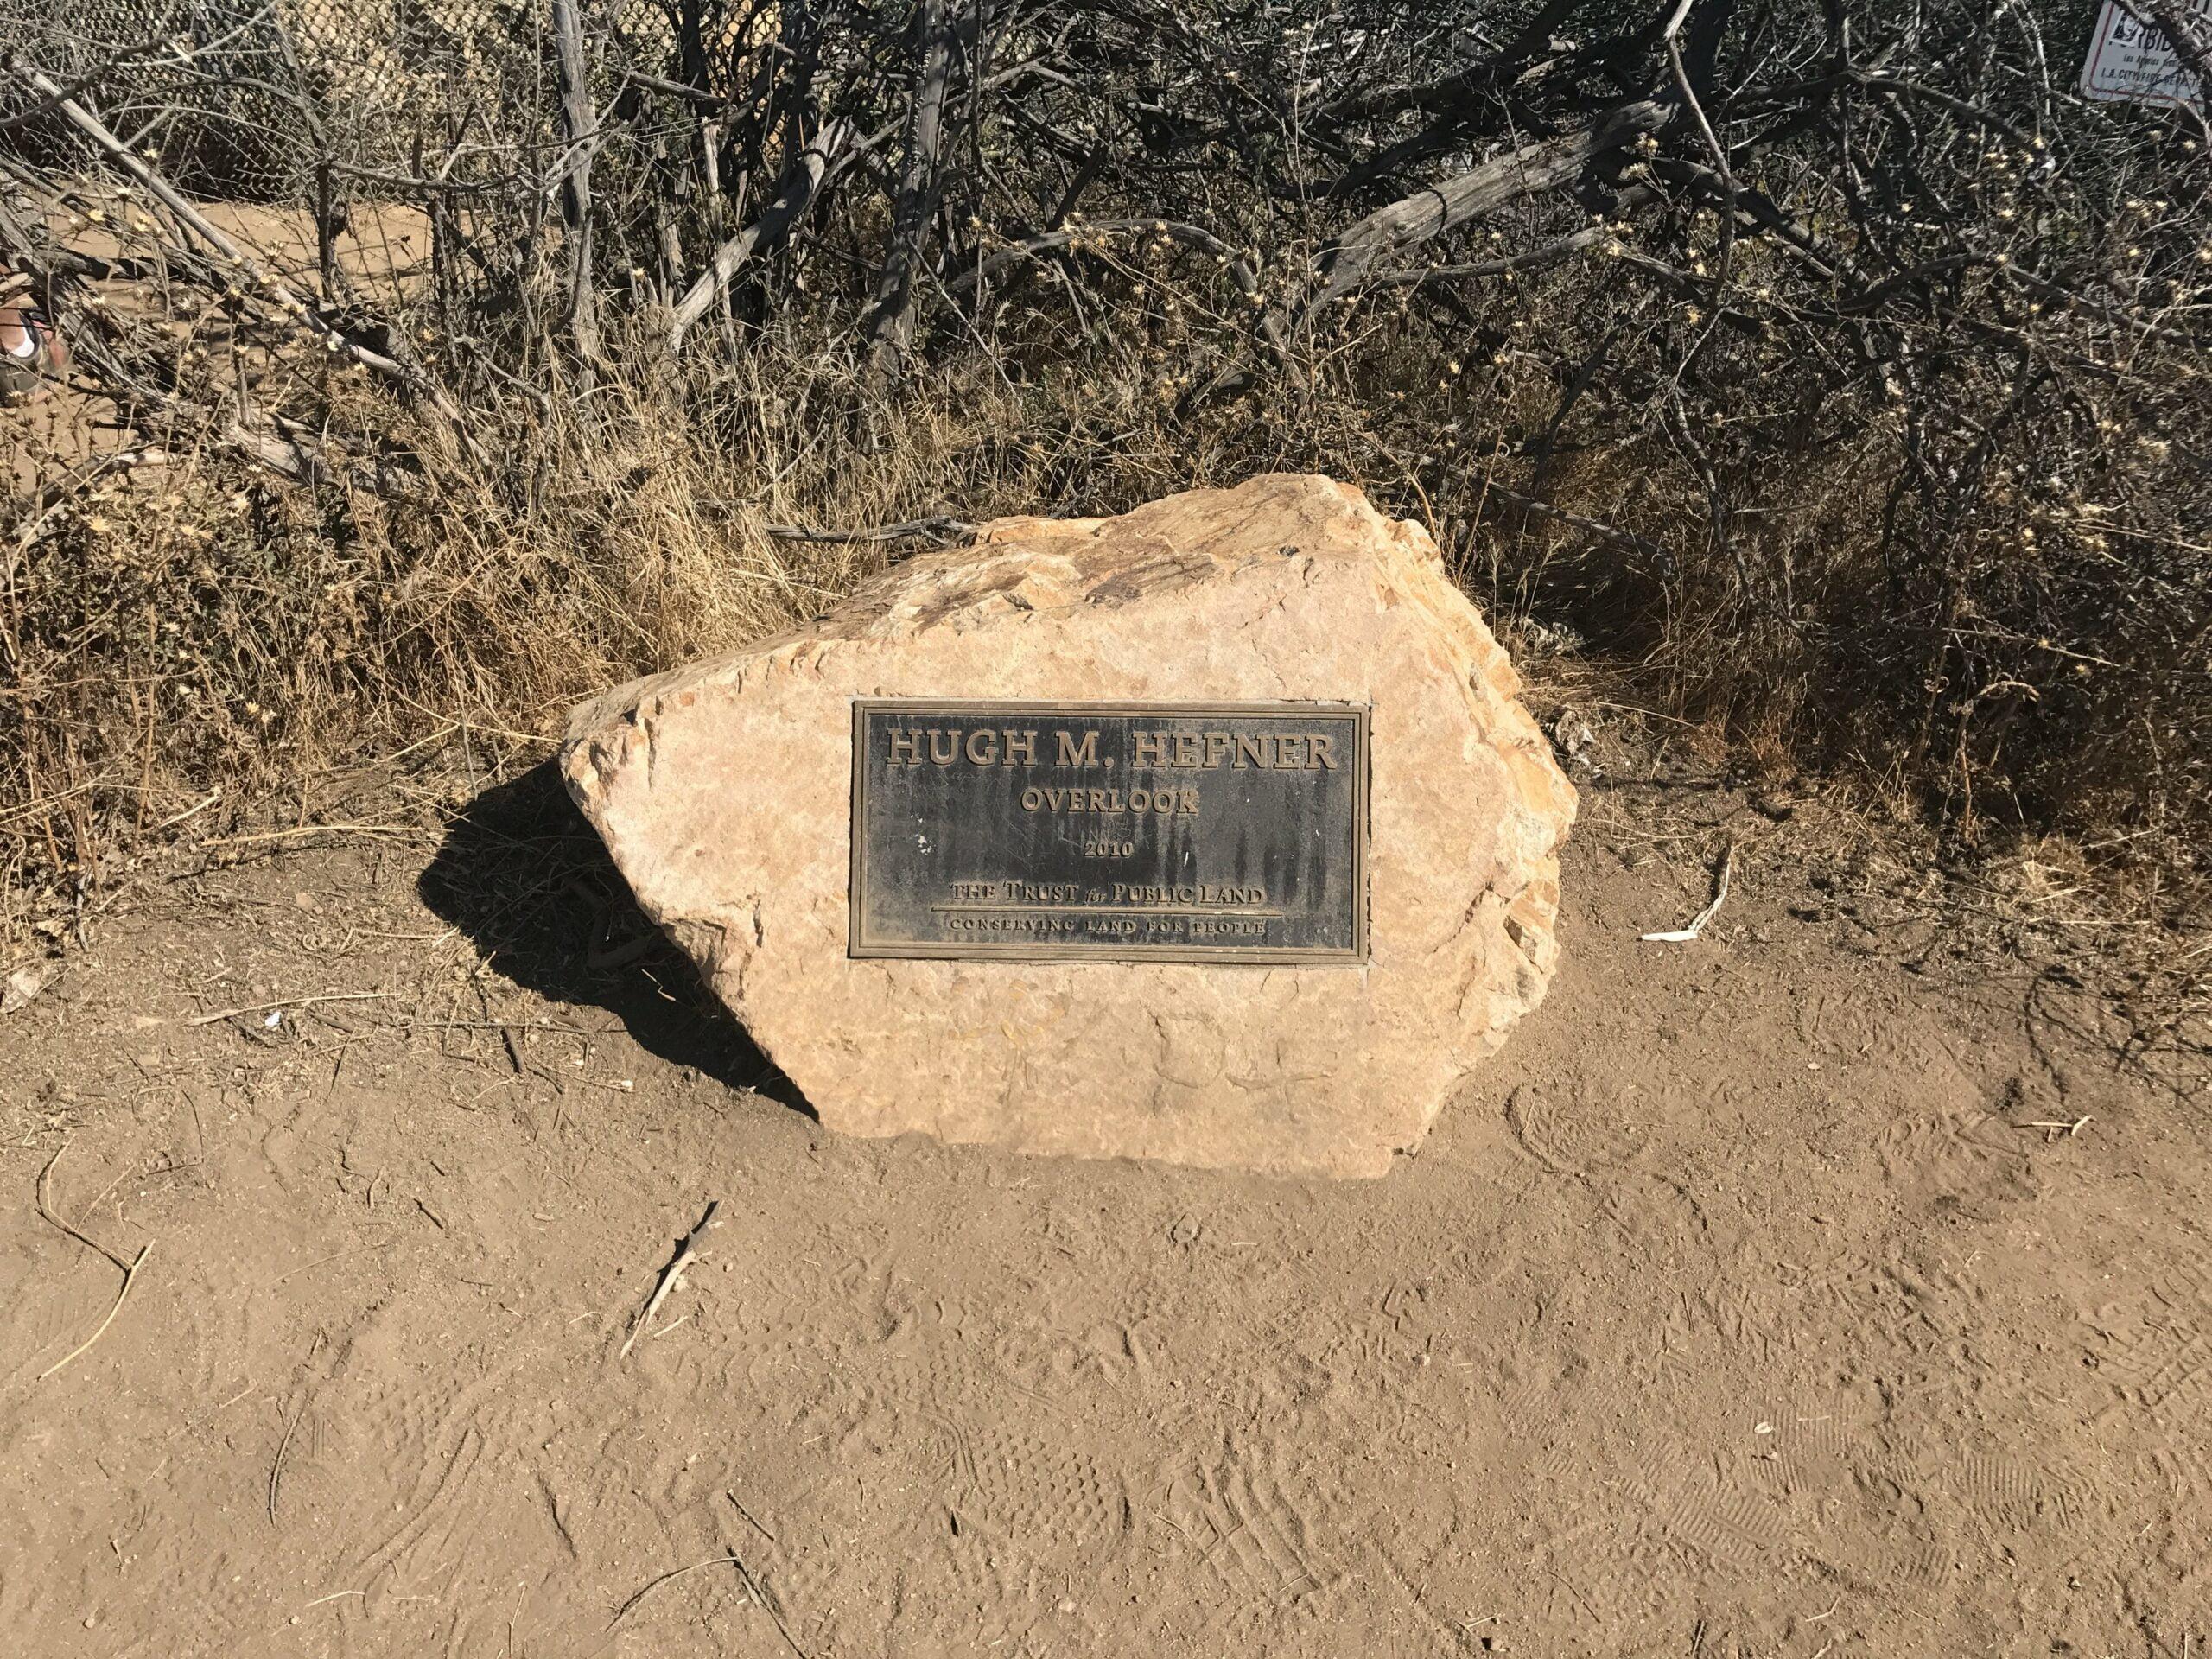 Hugh M. Hefner memorial stone